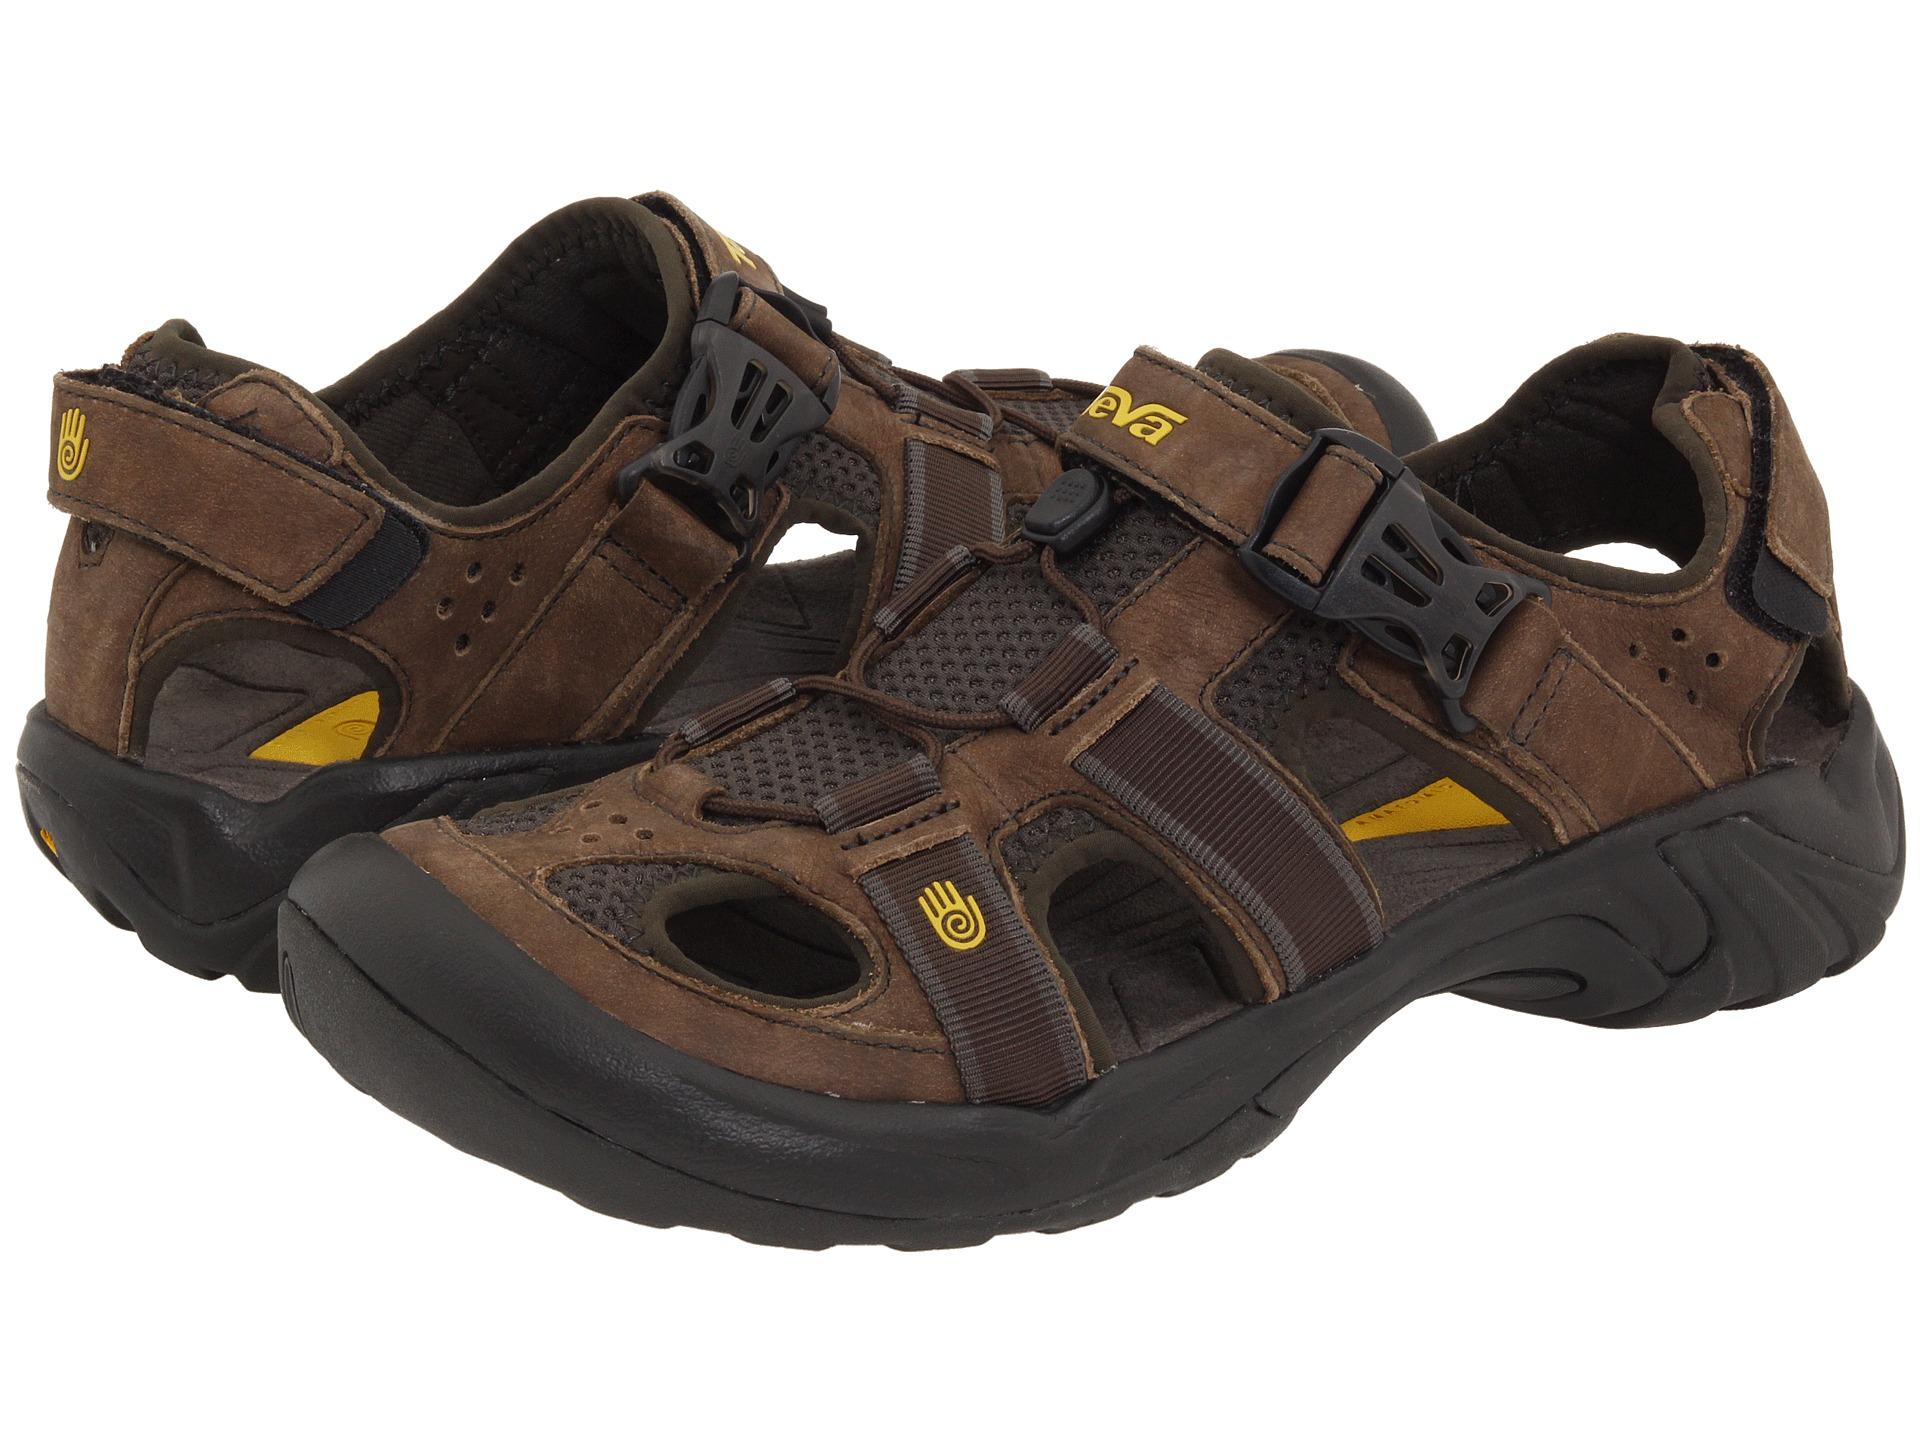 Teva Omnium Leather In Brown For Men Lyst